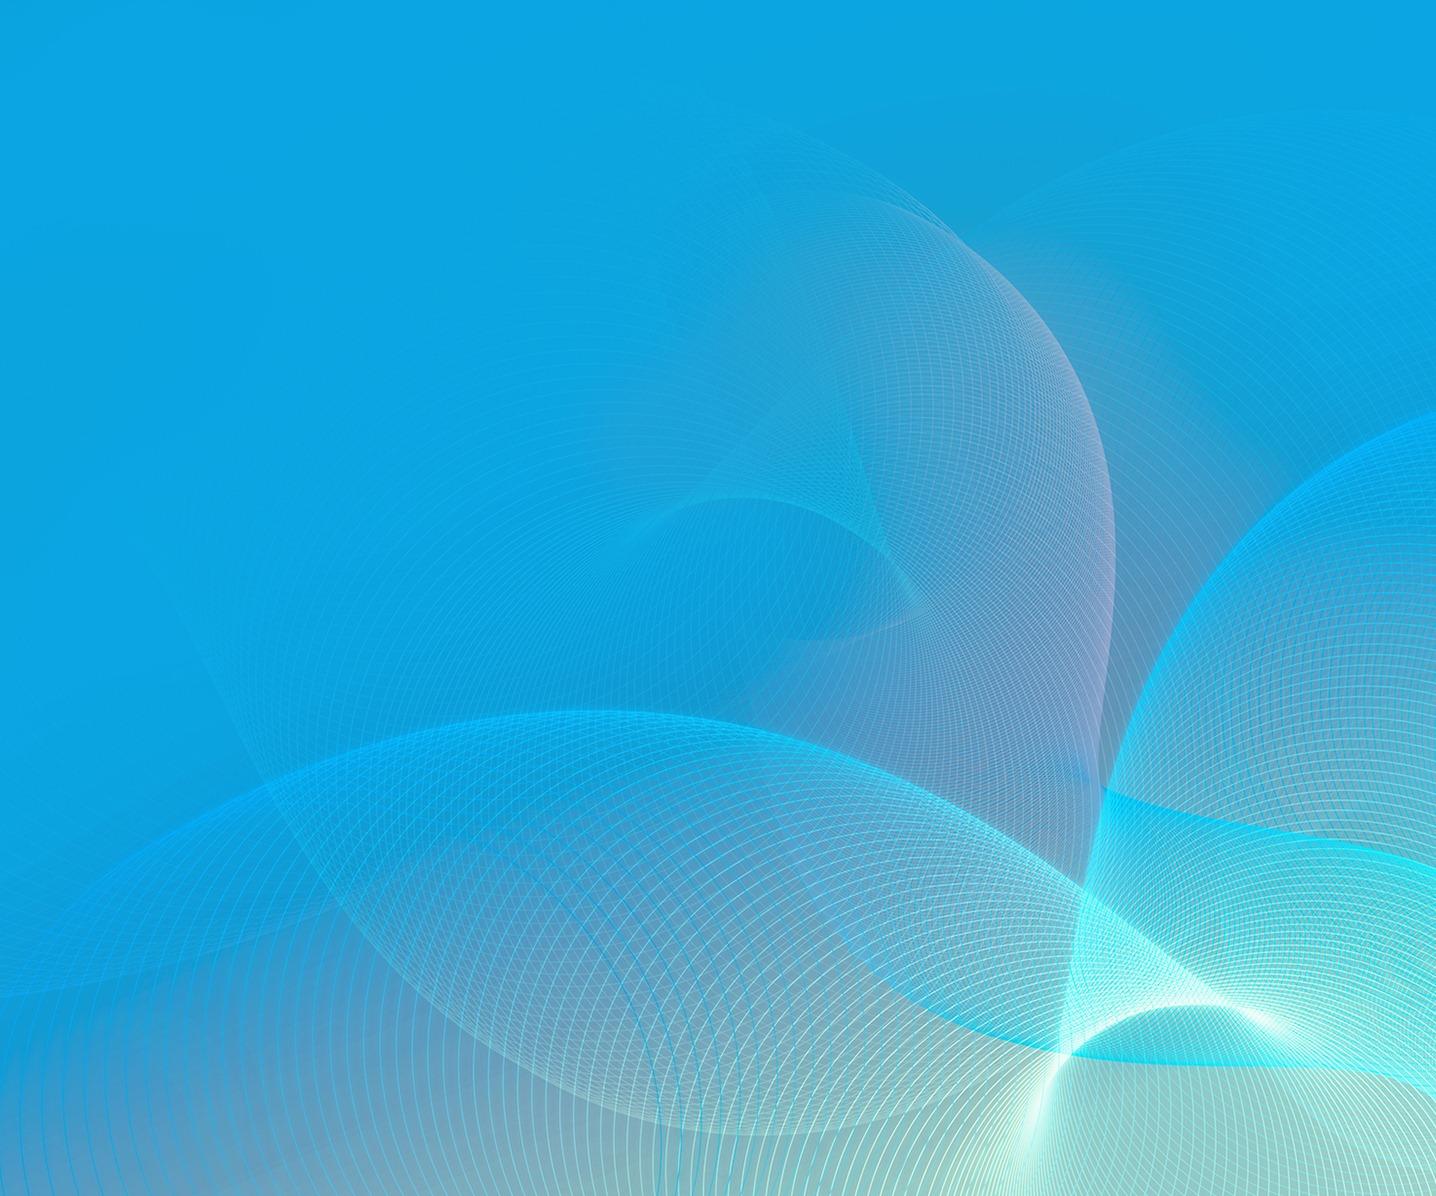 http://4.bp.blogspot.com/-utJiikEpaAE/UJME5RLtFWI/AAAAAAAArlA/3acqZKPhkd8/s1600/nexusae0_wallpaper_02.jpg